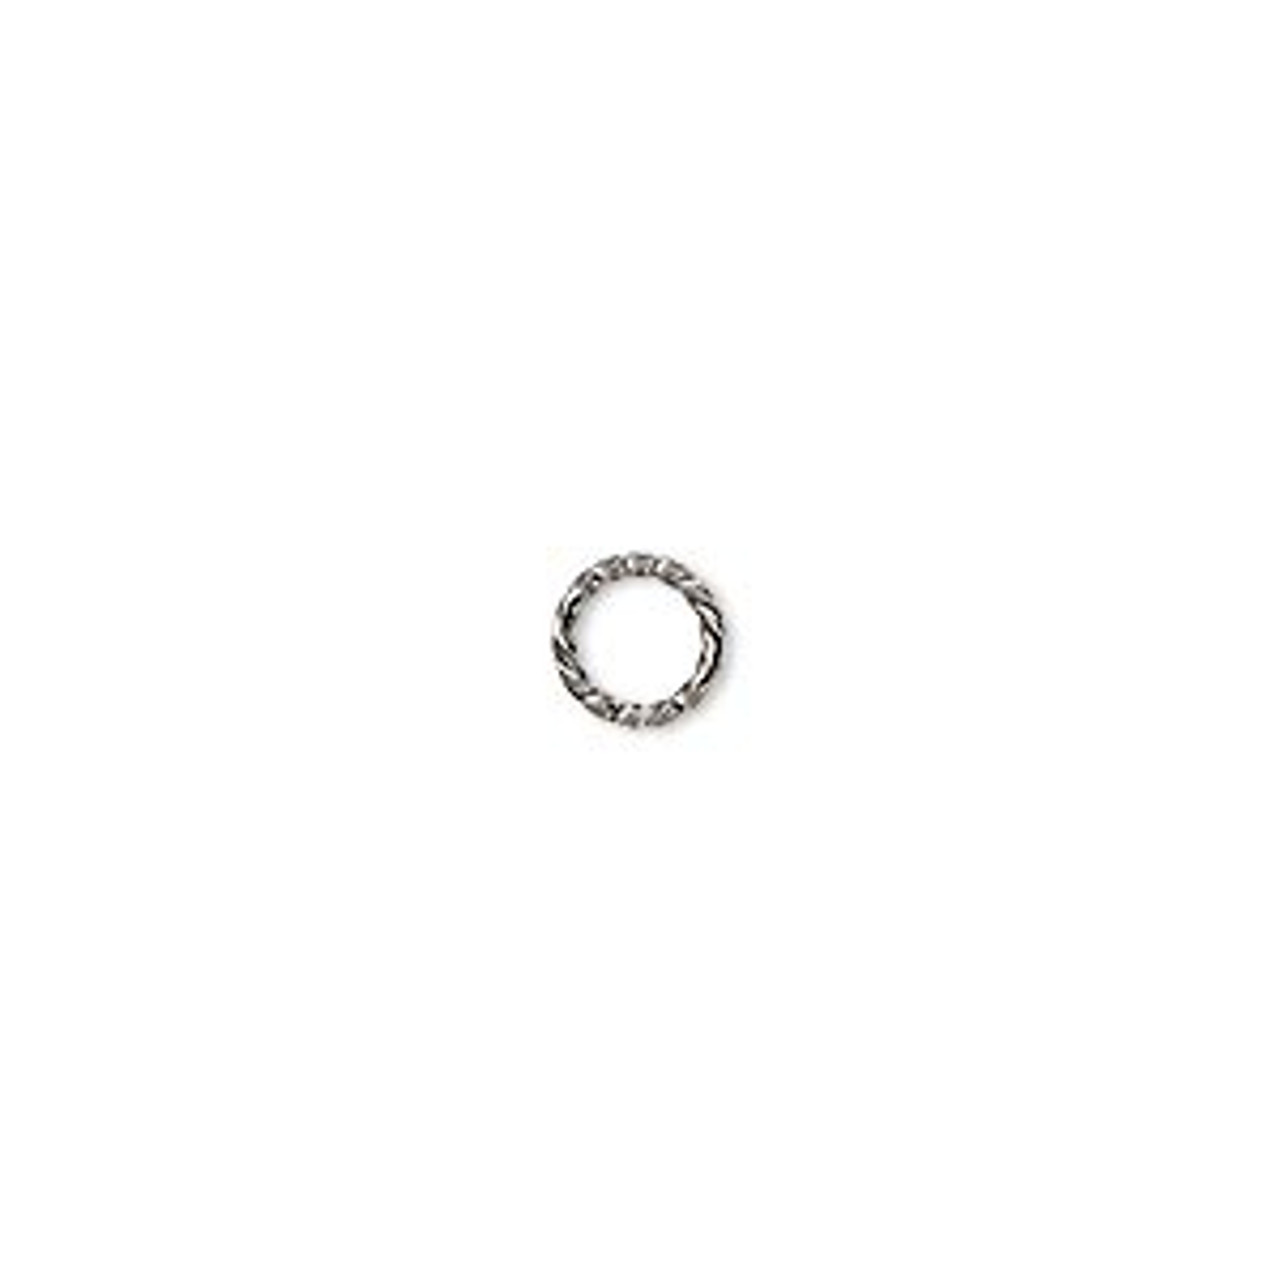 6mm Gunmetal Twisted Jump Rings (20 Pack)